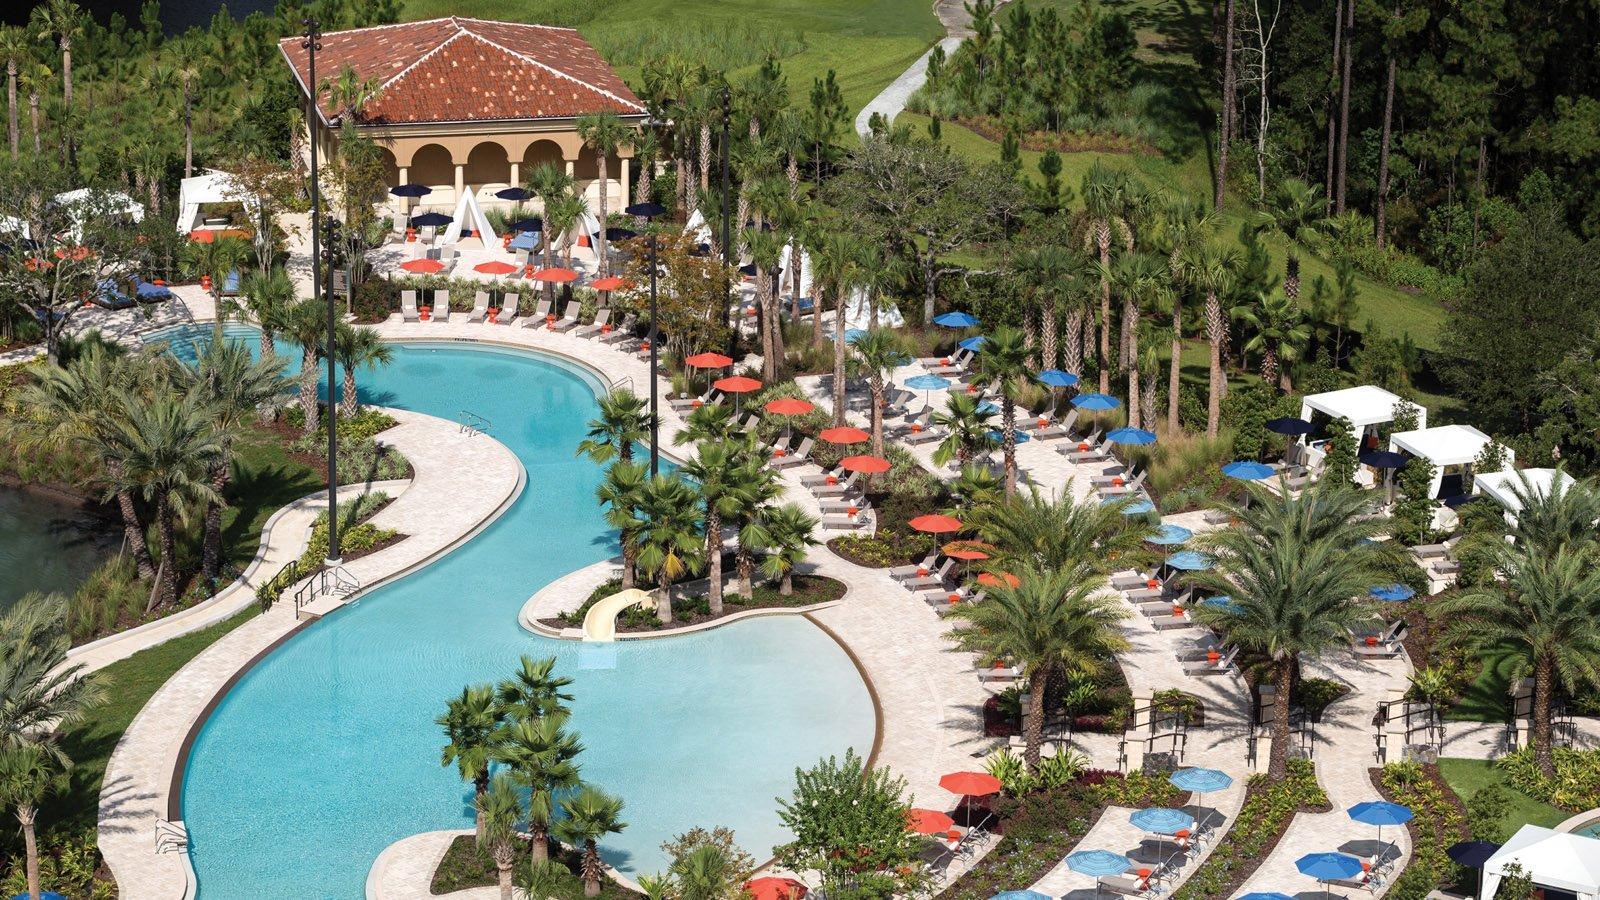 Splash Into Summer At Four Seasons Resort Orlando